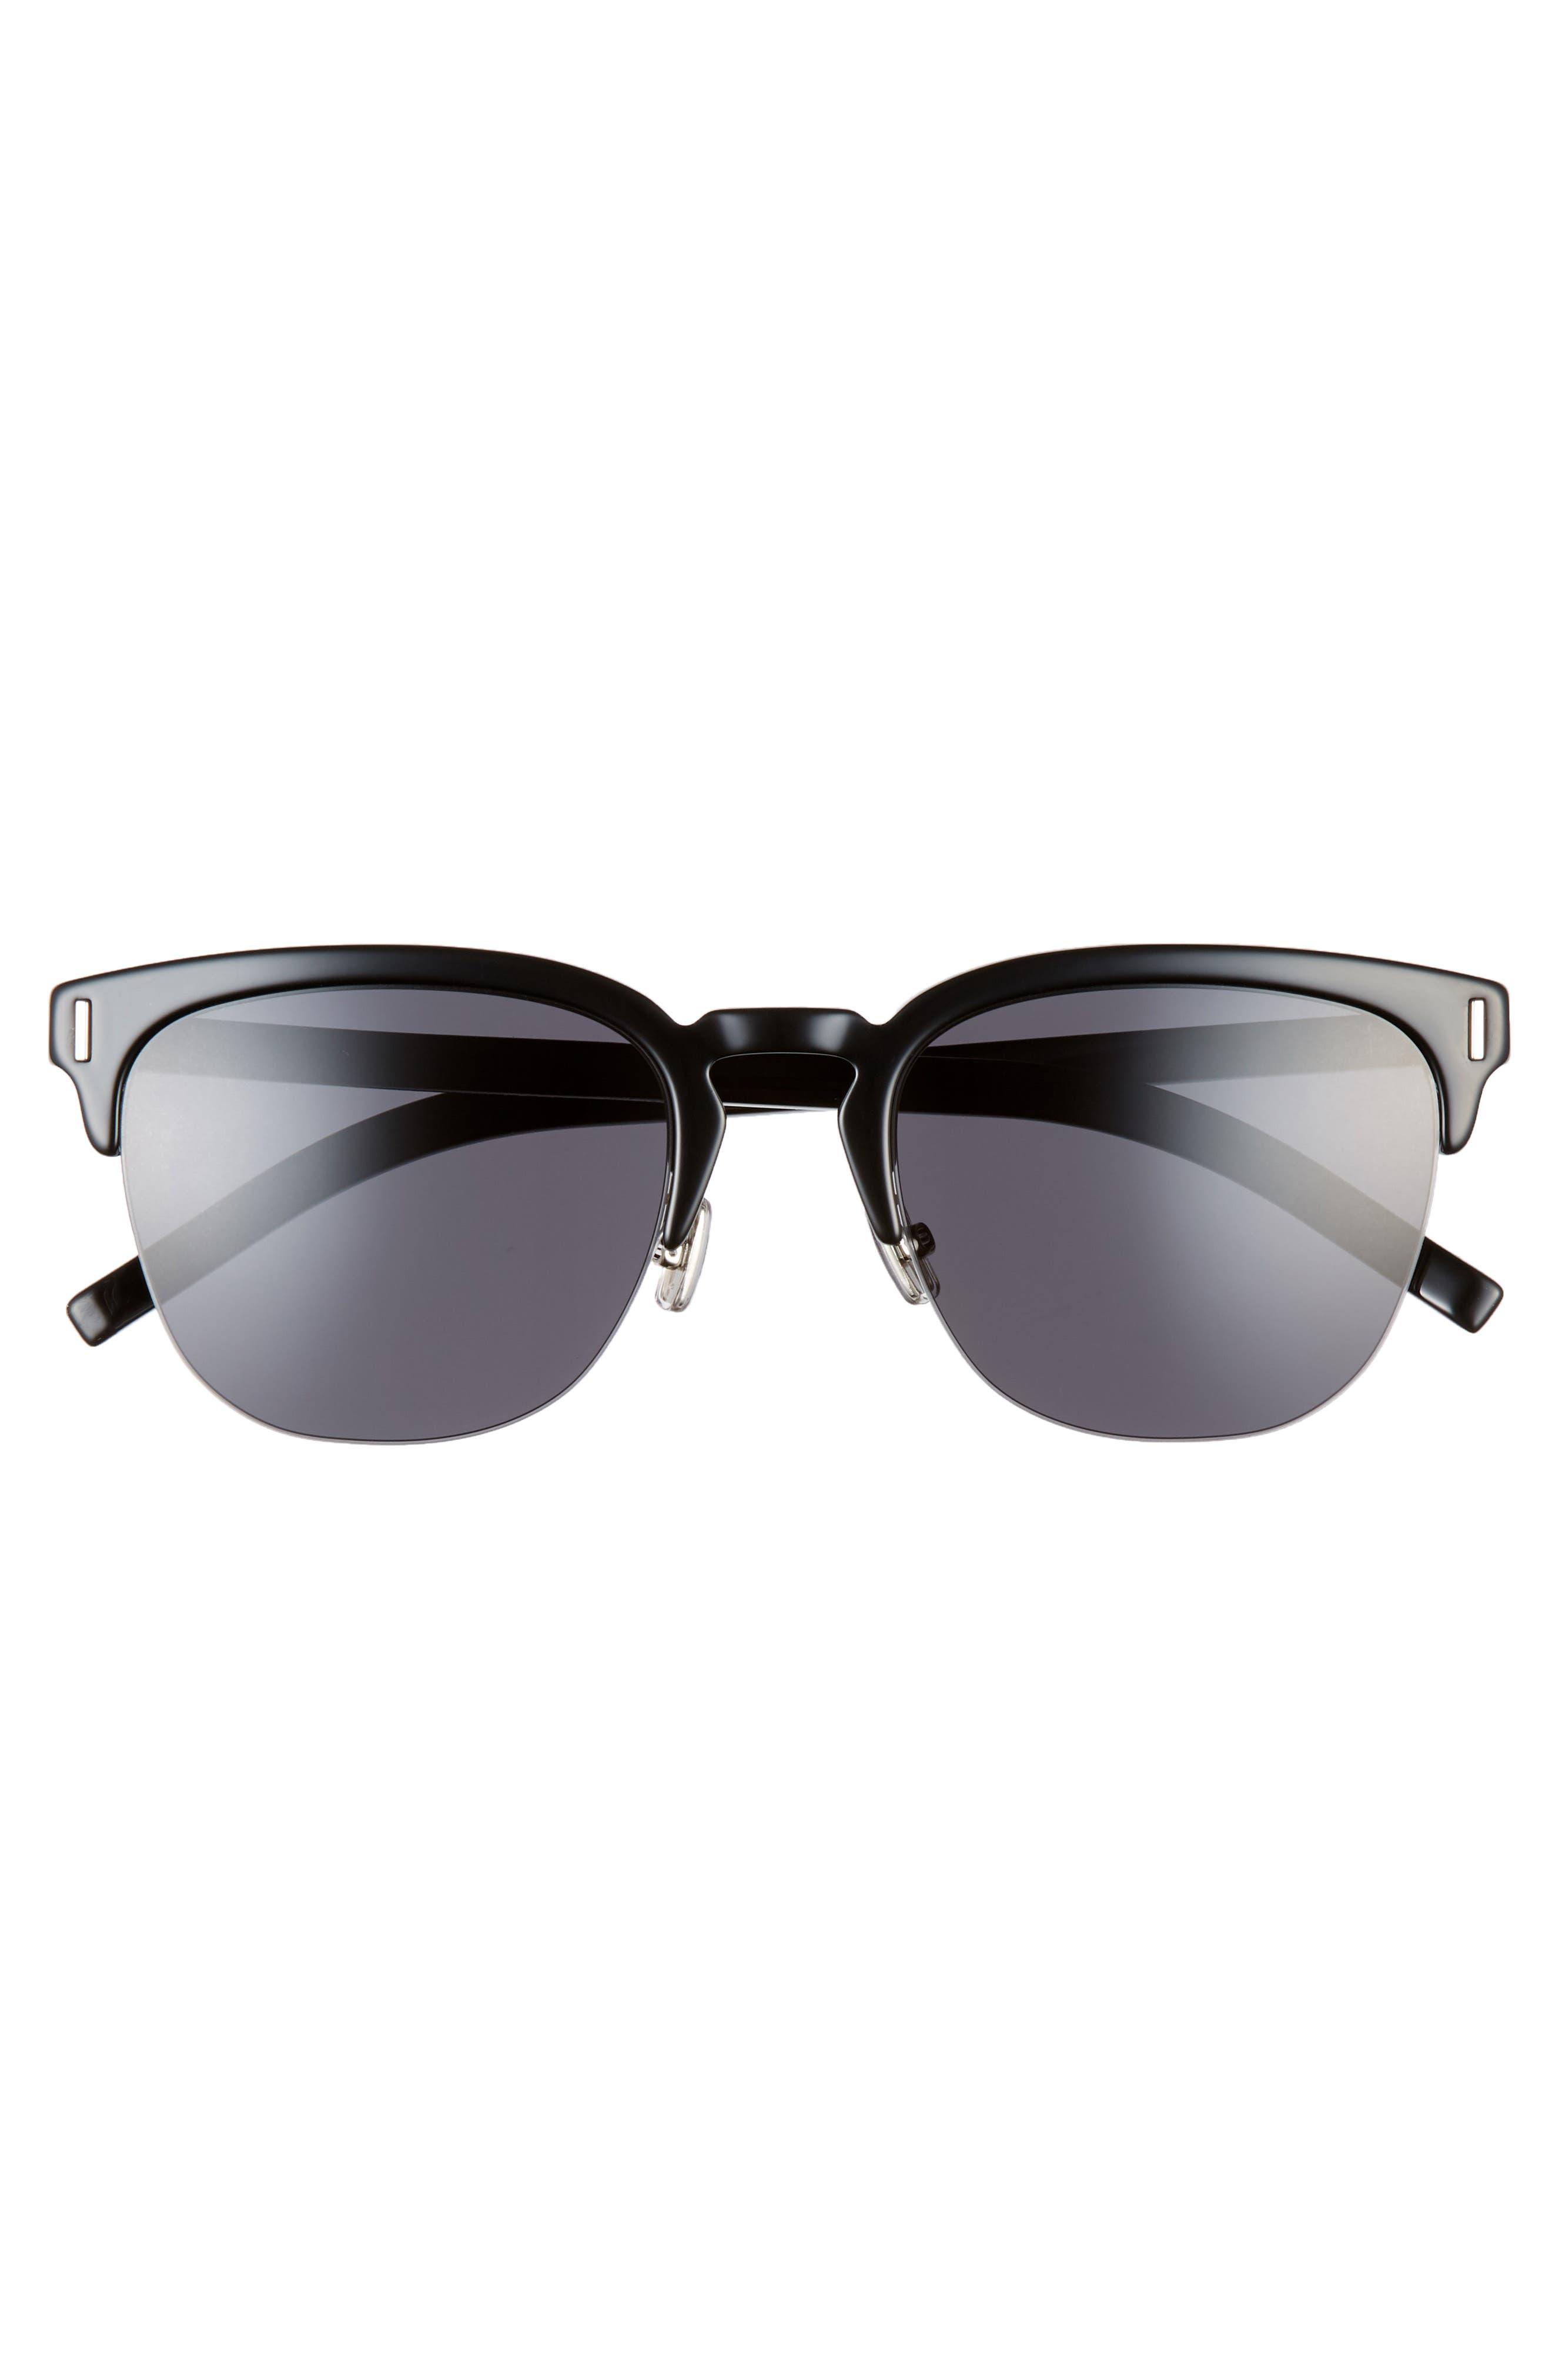 3f671157505 Men s Dior Homme Sunglasses   Eyeglasses